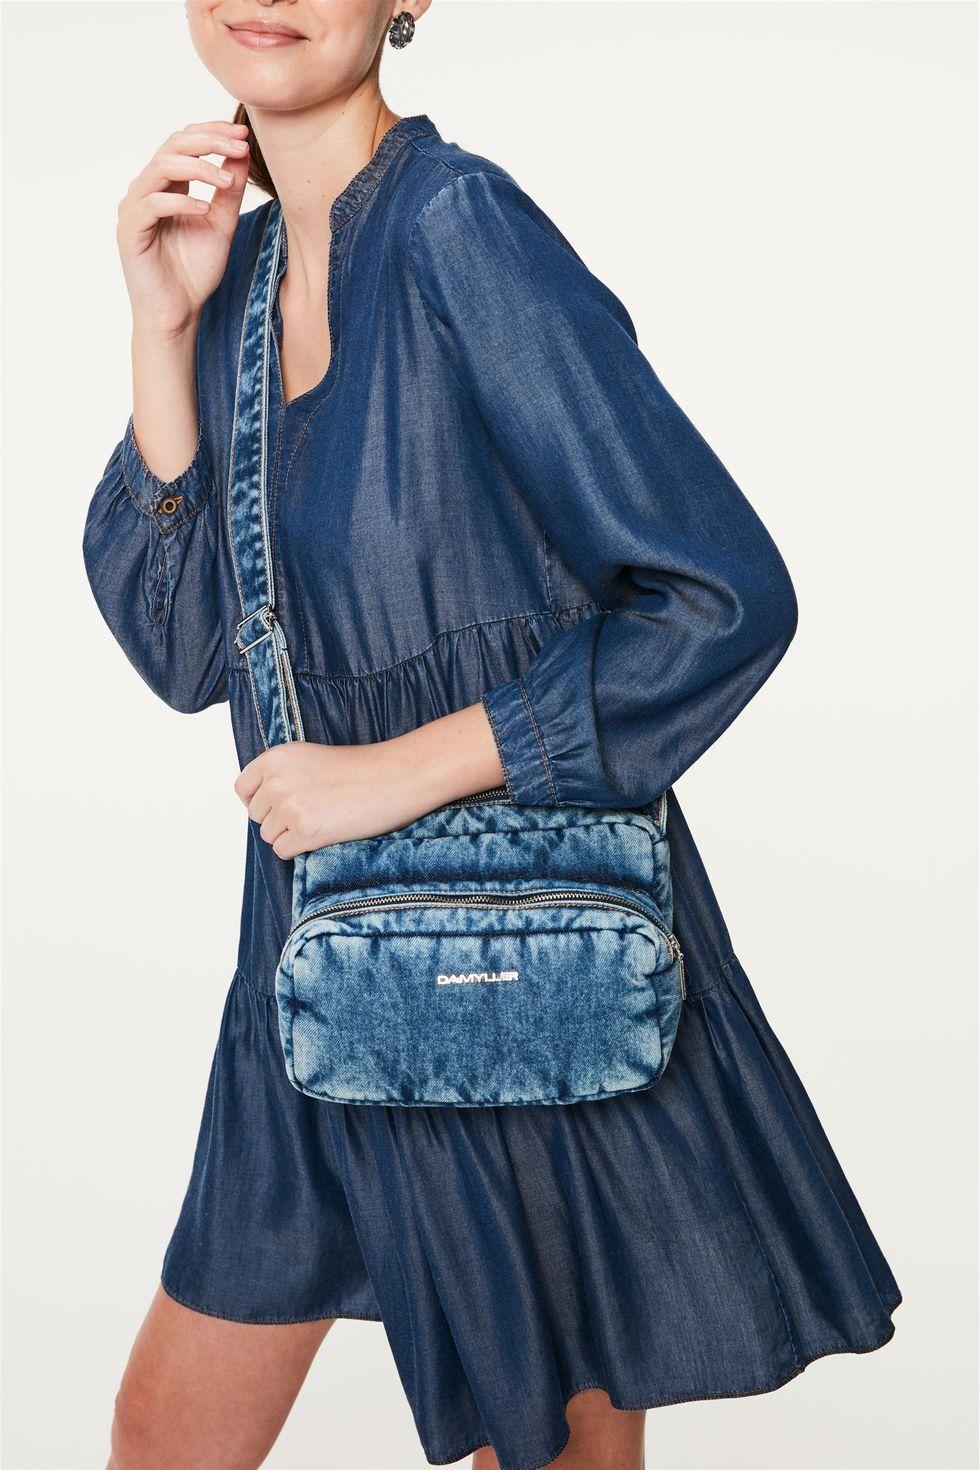 Bolsa-Jeans-Mini-Feminina-Ecodamyller-Frente--